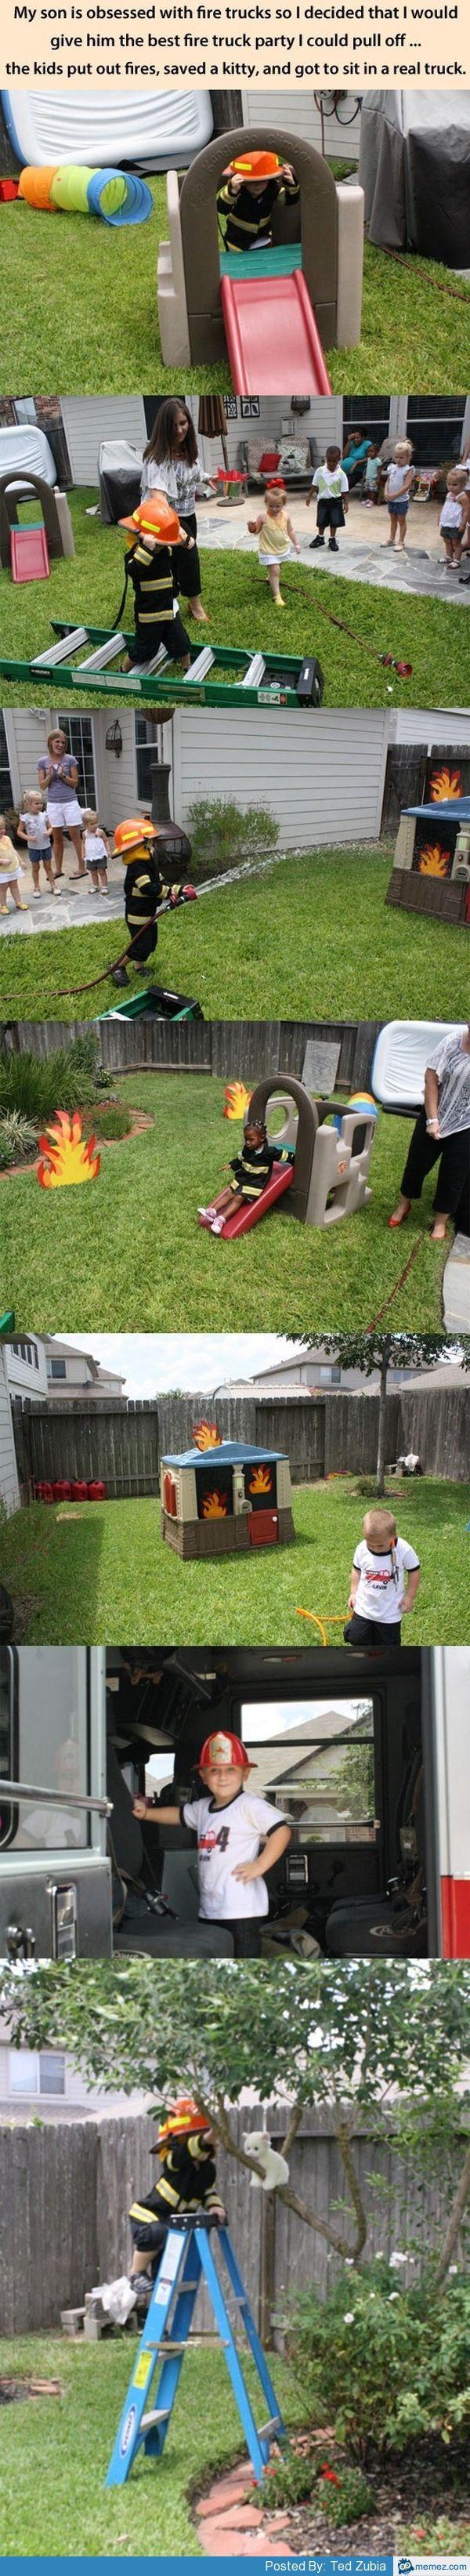 Genius idea for birthday party